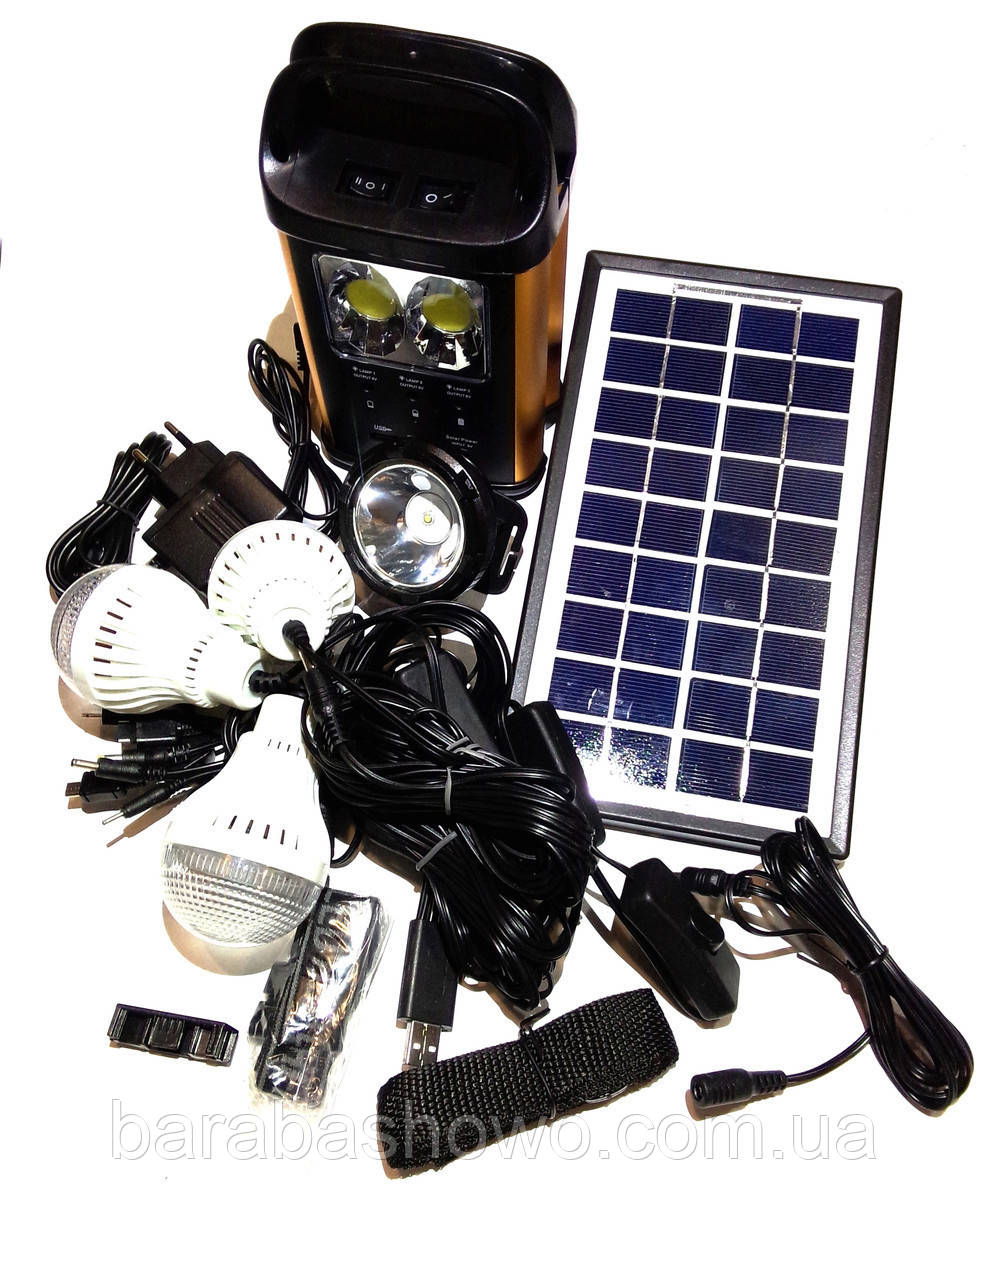 Універсальна портативна сонячна система GDLITE GD-8131(коногонка)